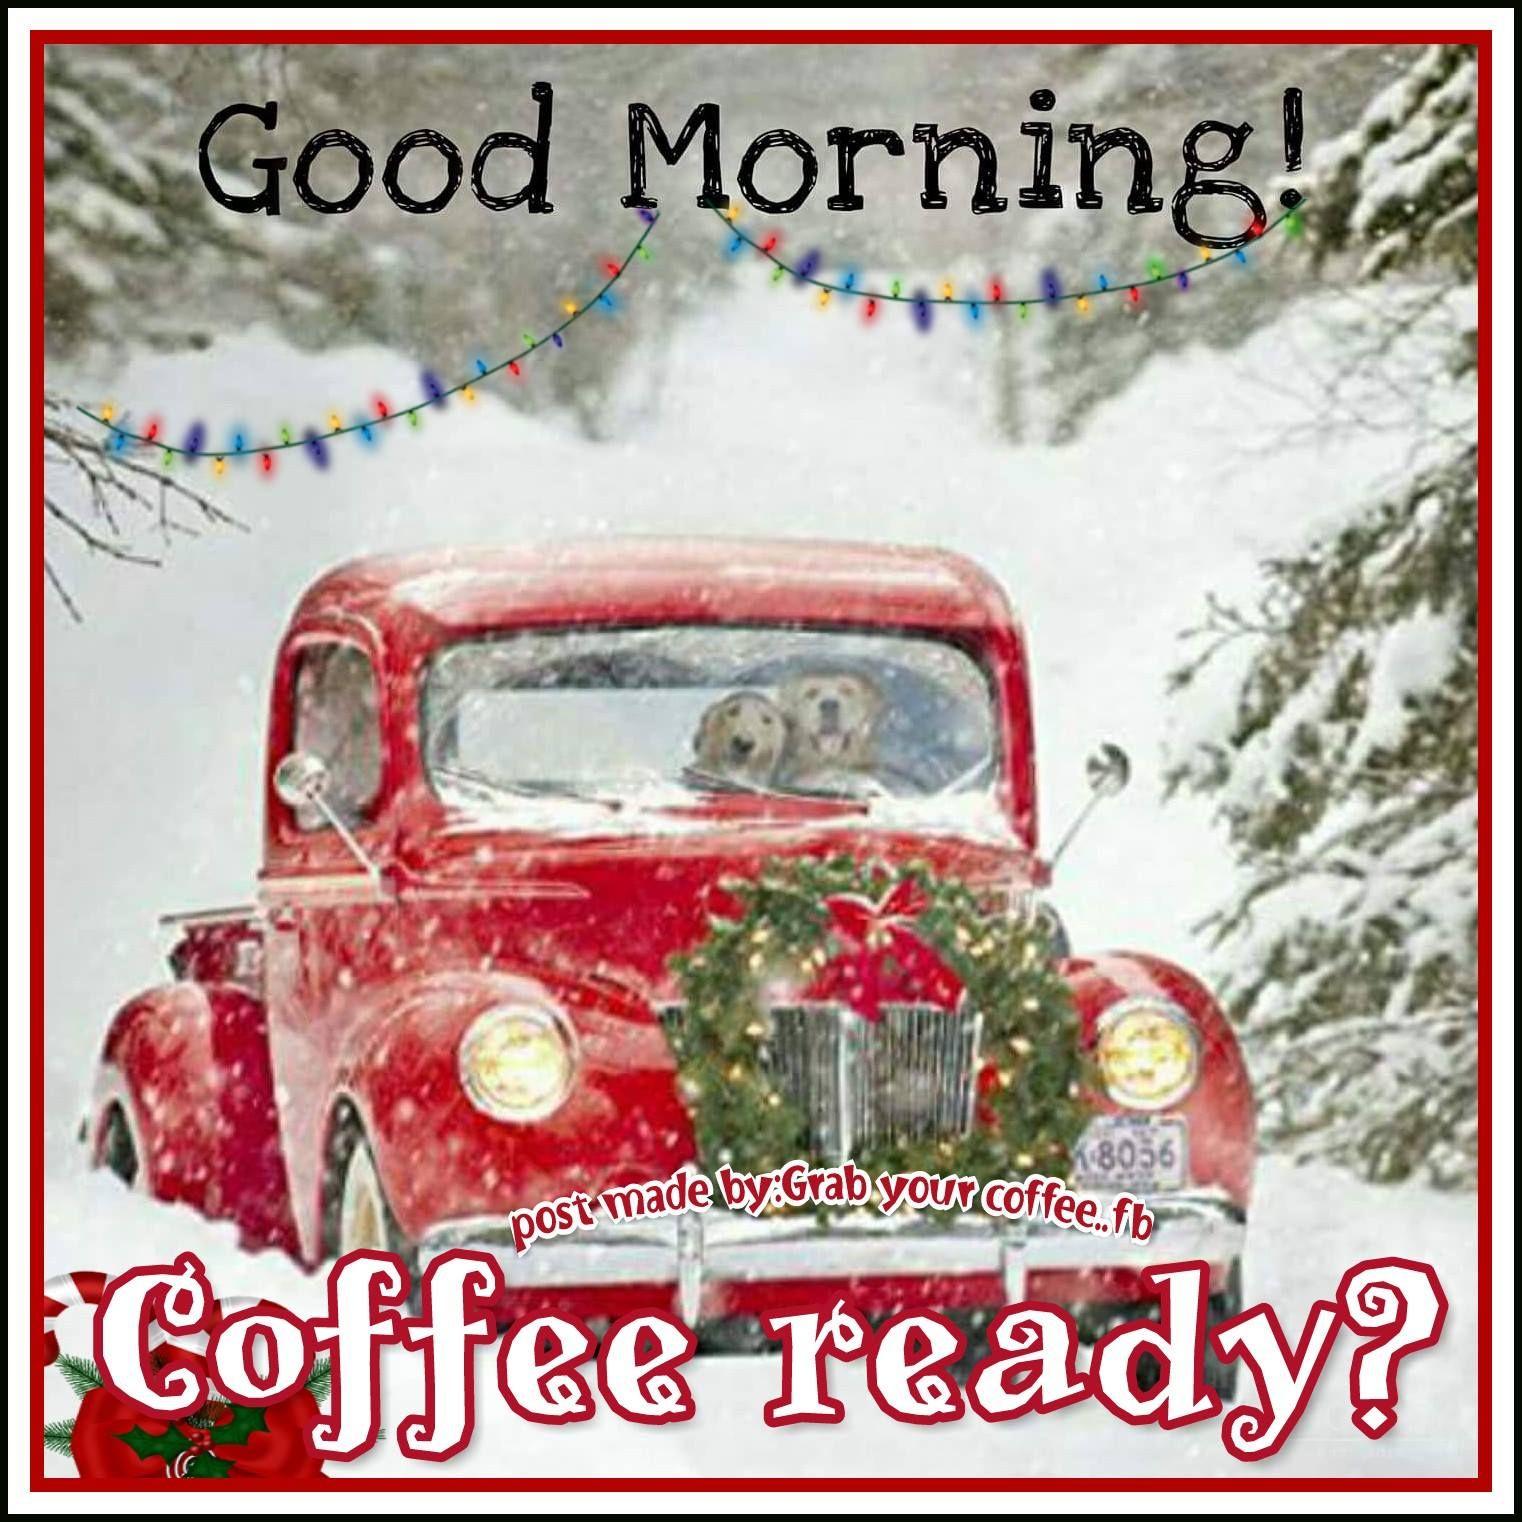 Good Morning Coffee Ready Christmas Coffee Christmas Red Truck Good Morning Coffee